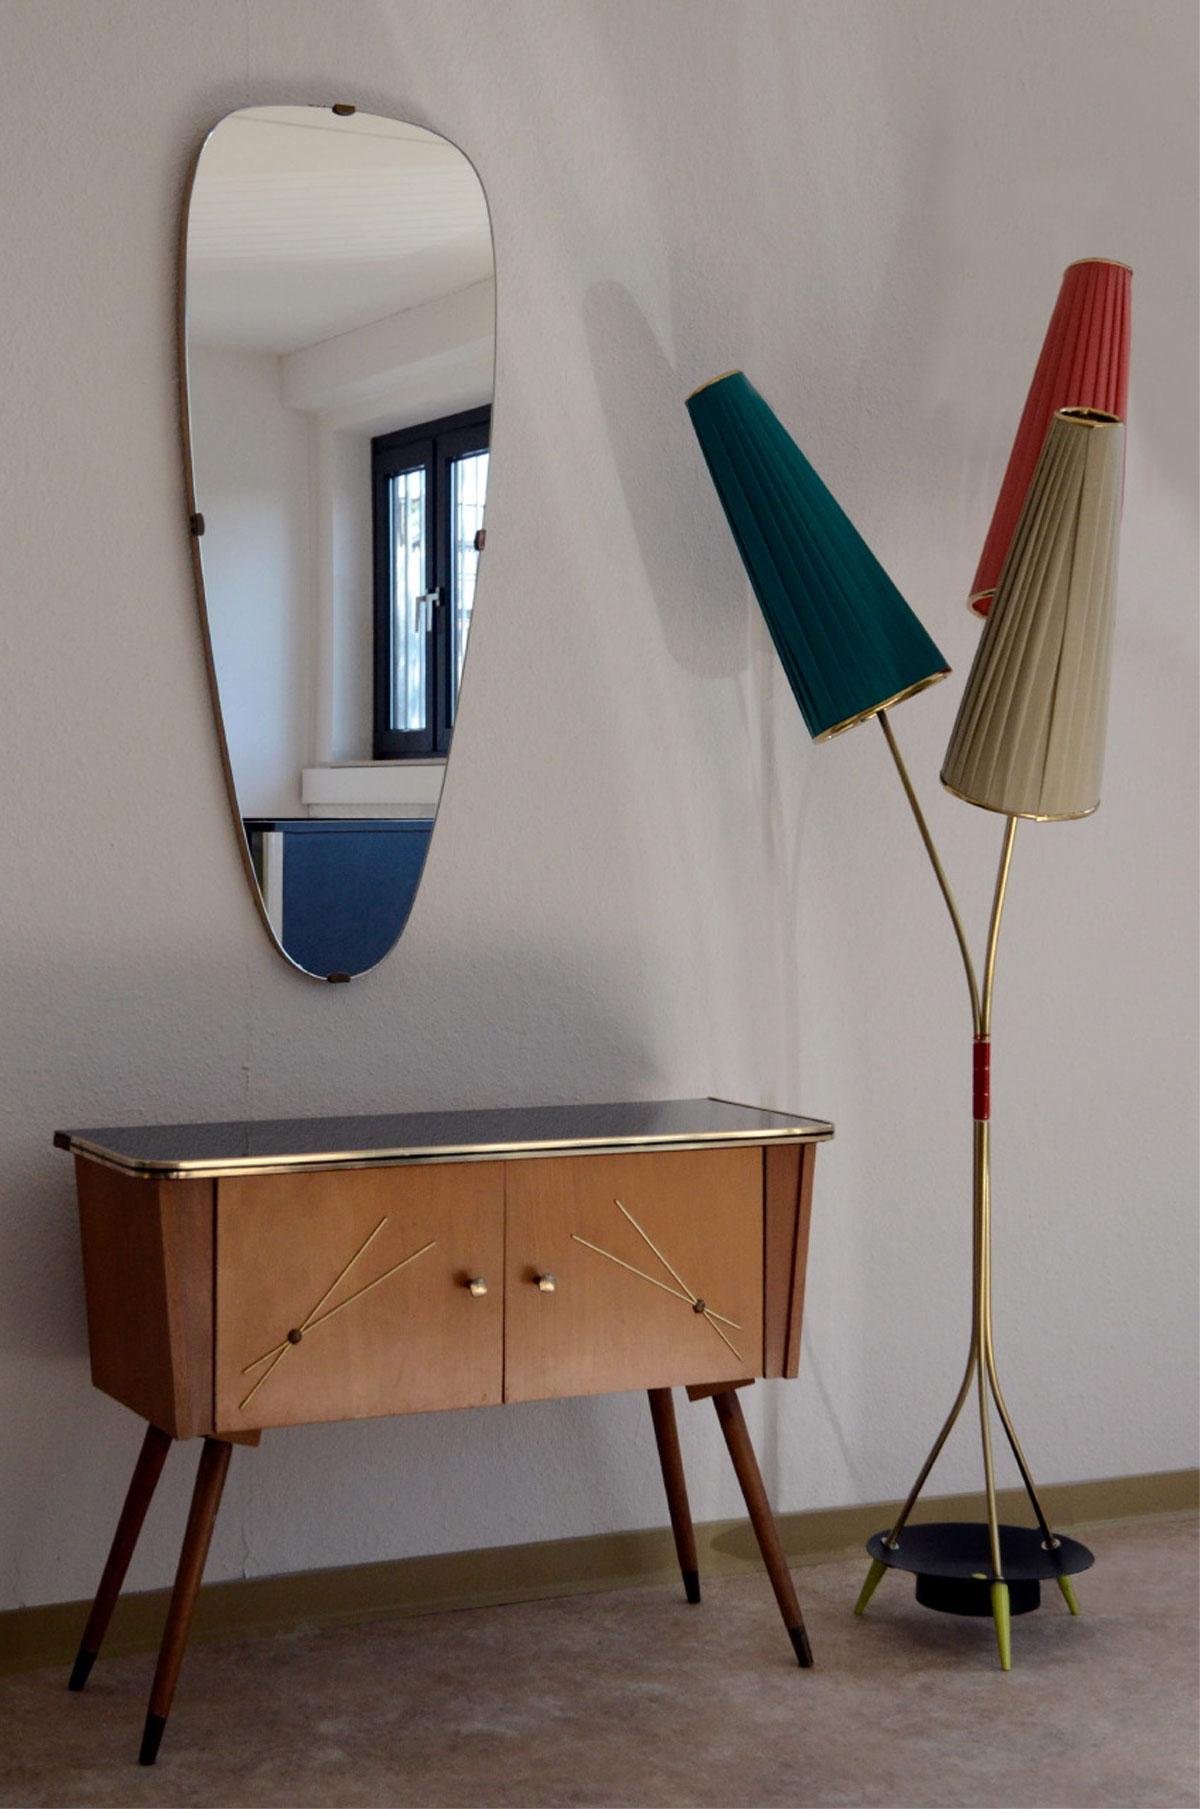 Badezimmer Lampe Amazon